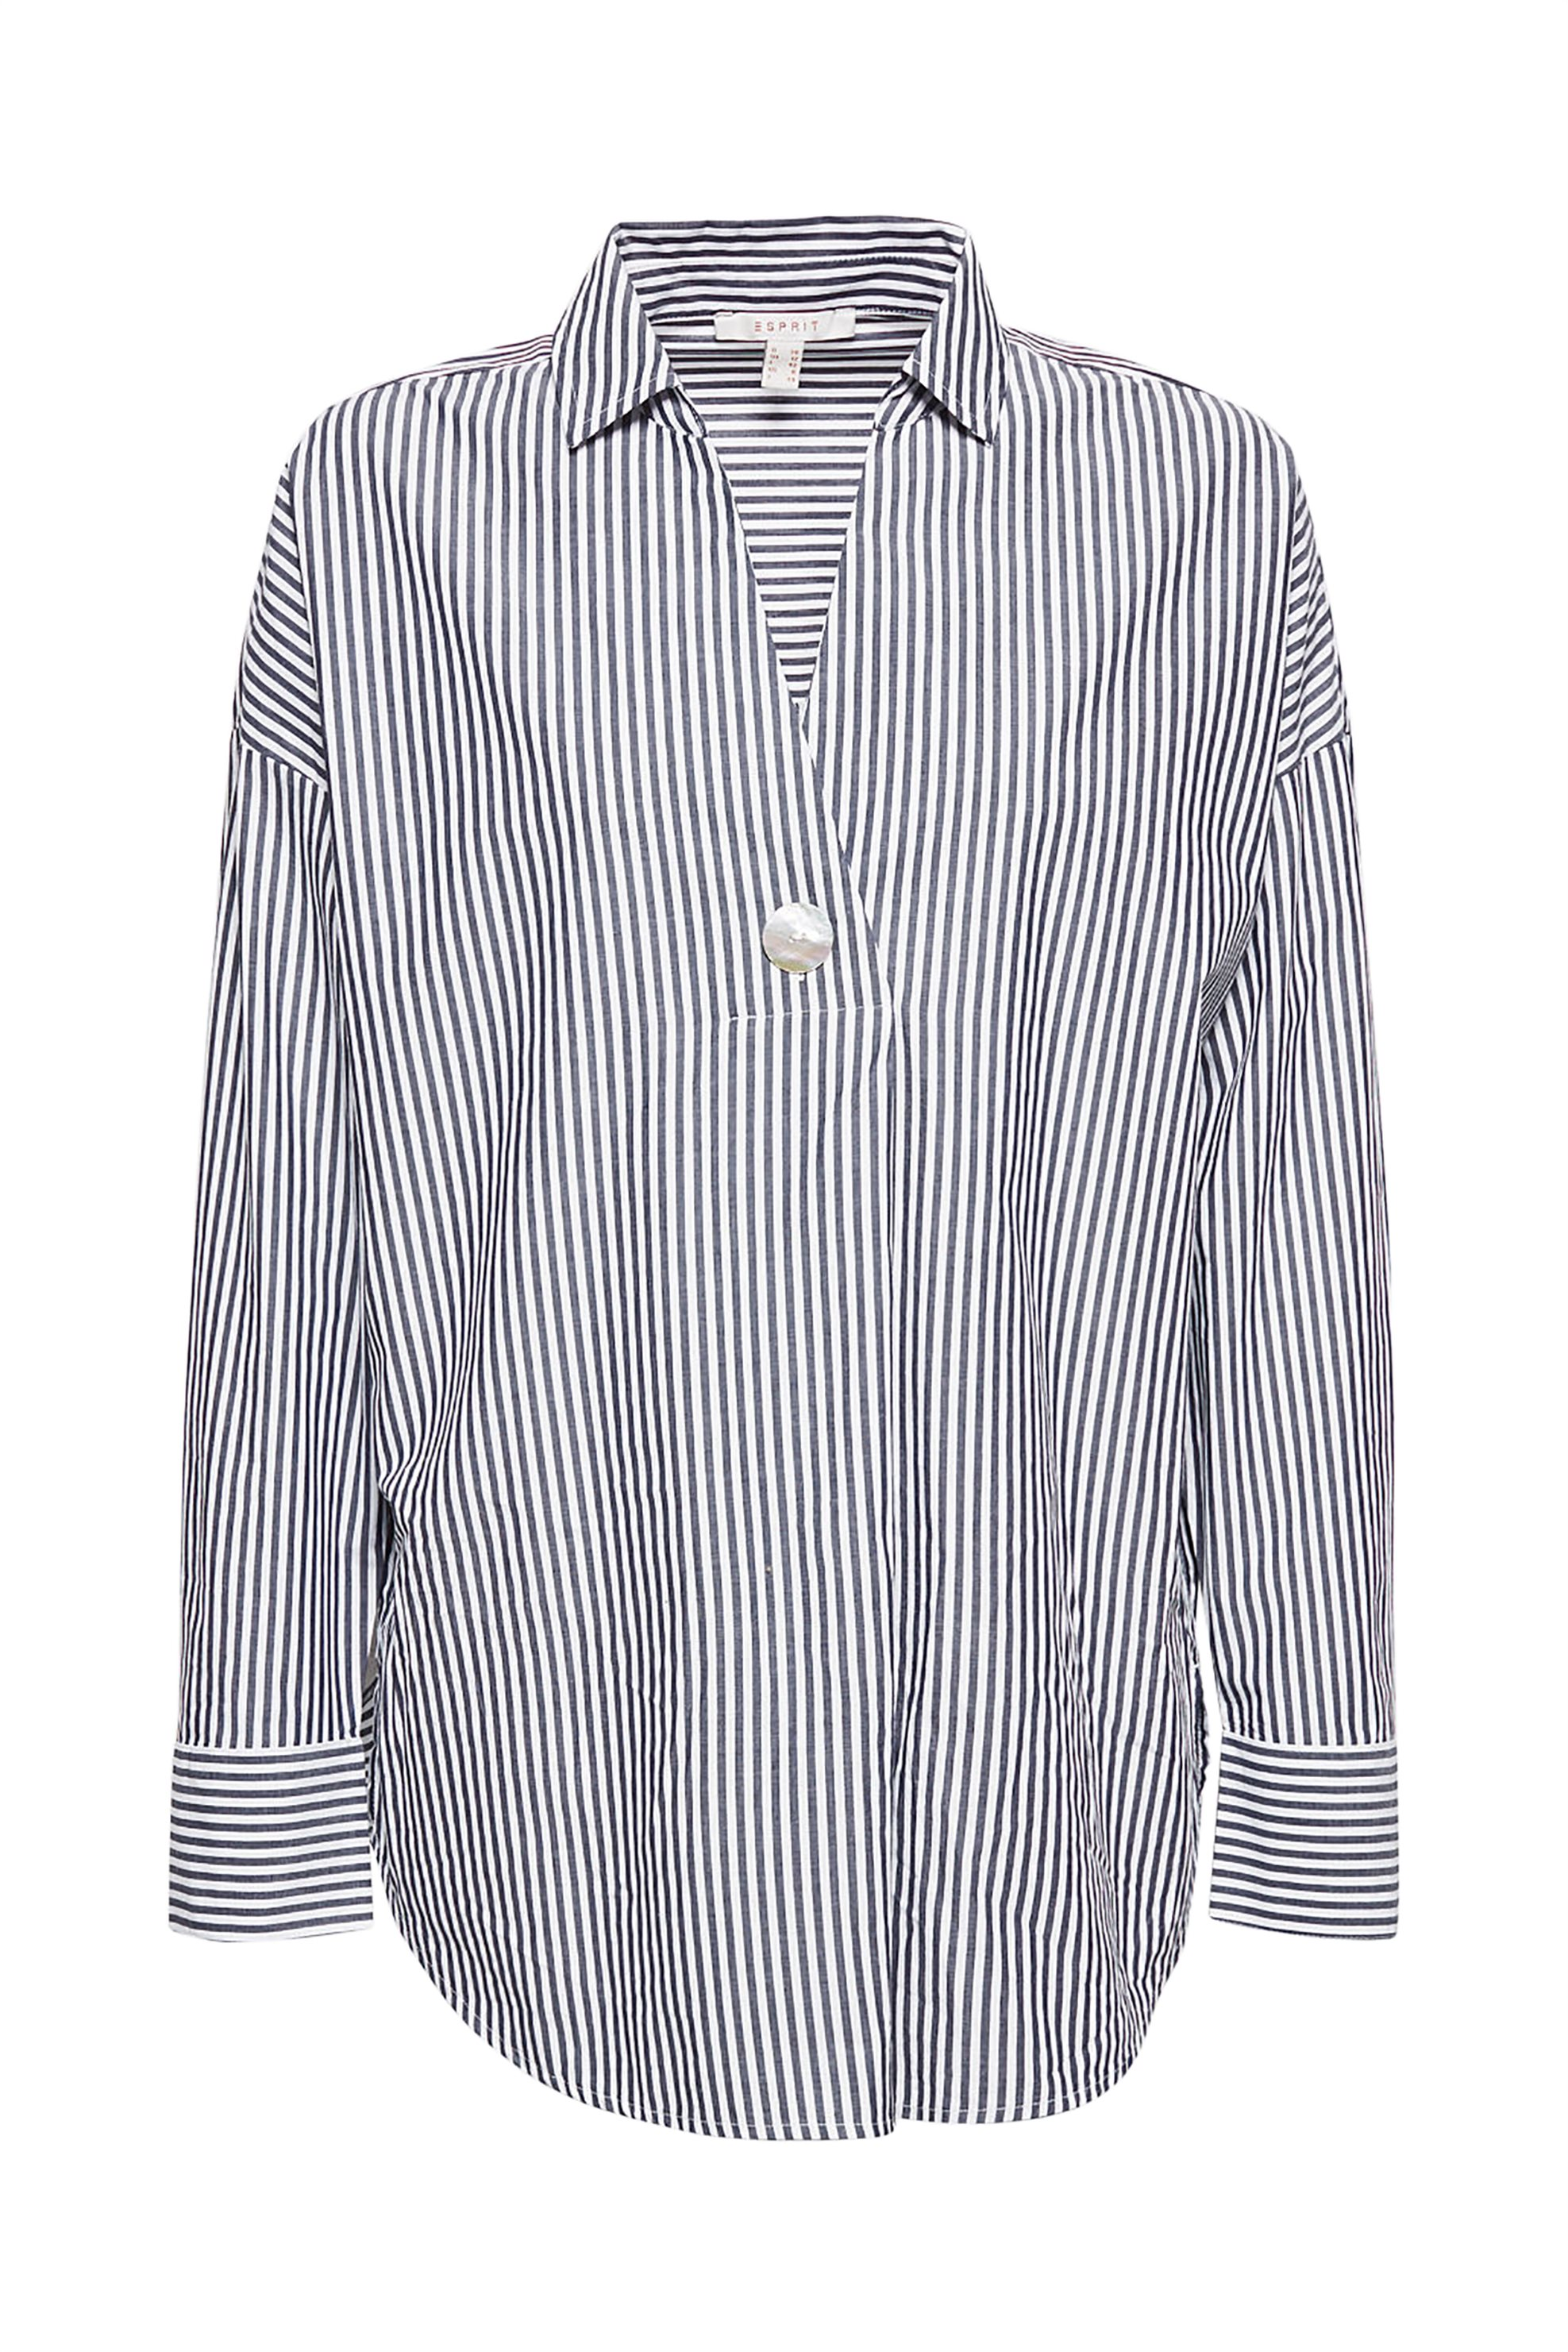 Esprit γυναικεία ριγέ πουκαμίσα με κουμπί - 029EE1F019 - Μπλε γυναικα   ρουχα   tops   πουκάμισα   πουκαμίσες   καφτάνια